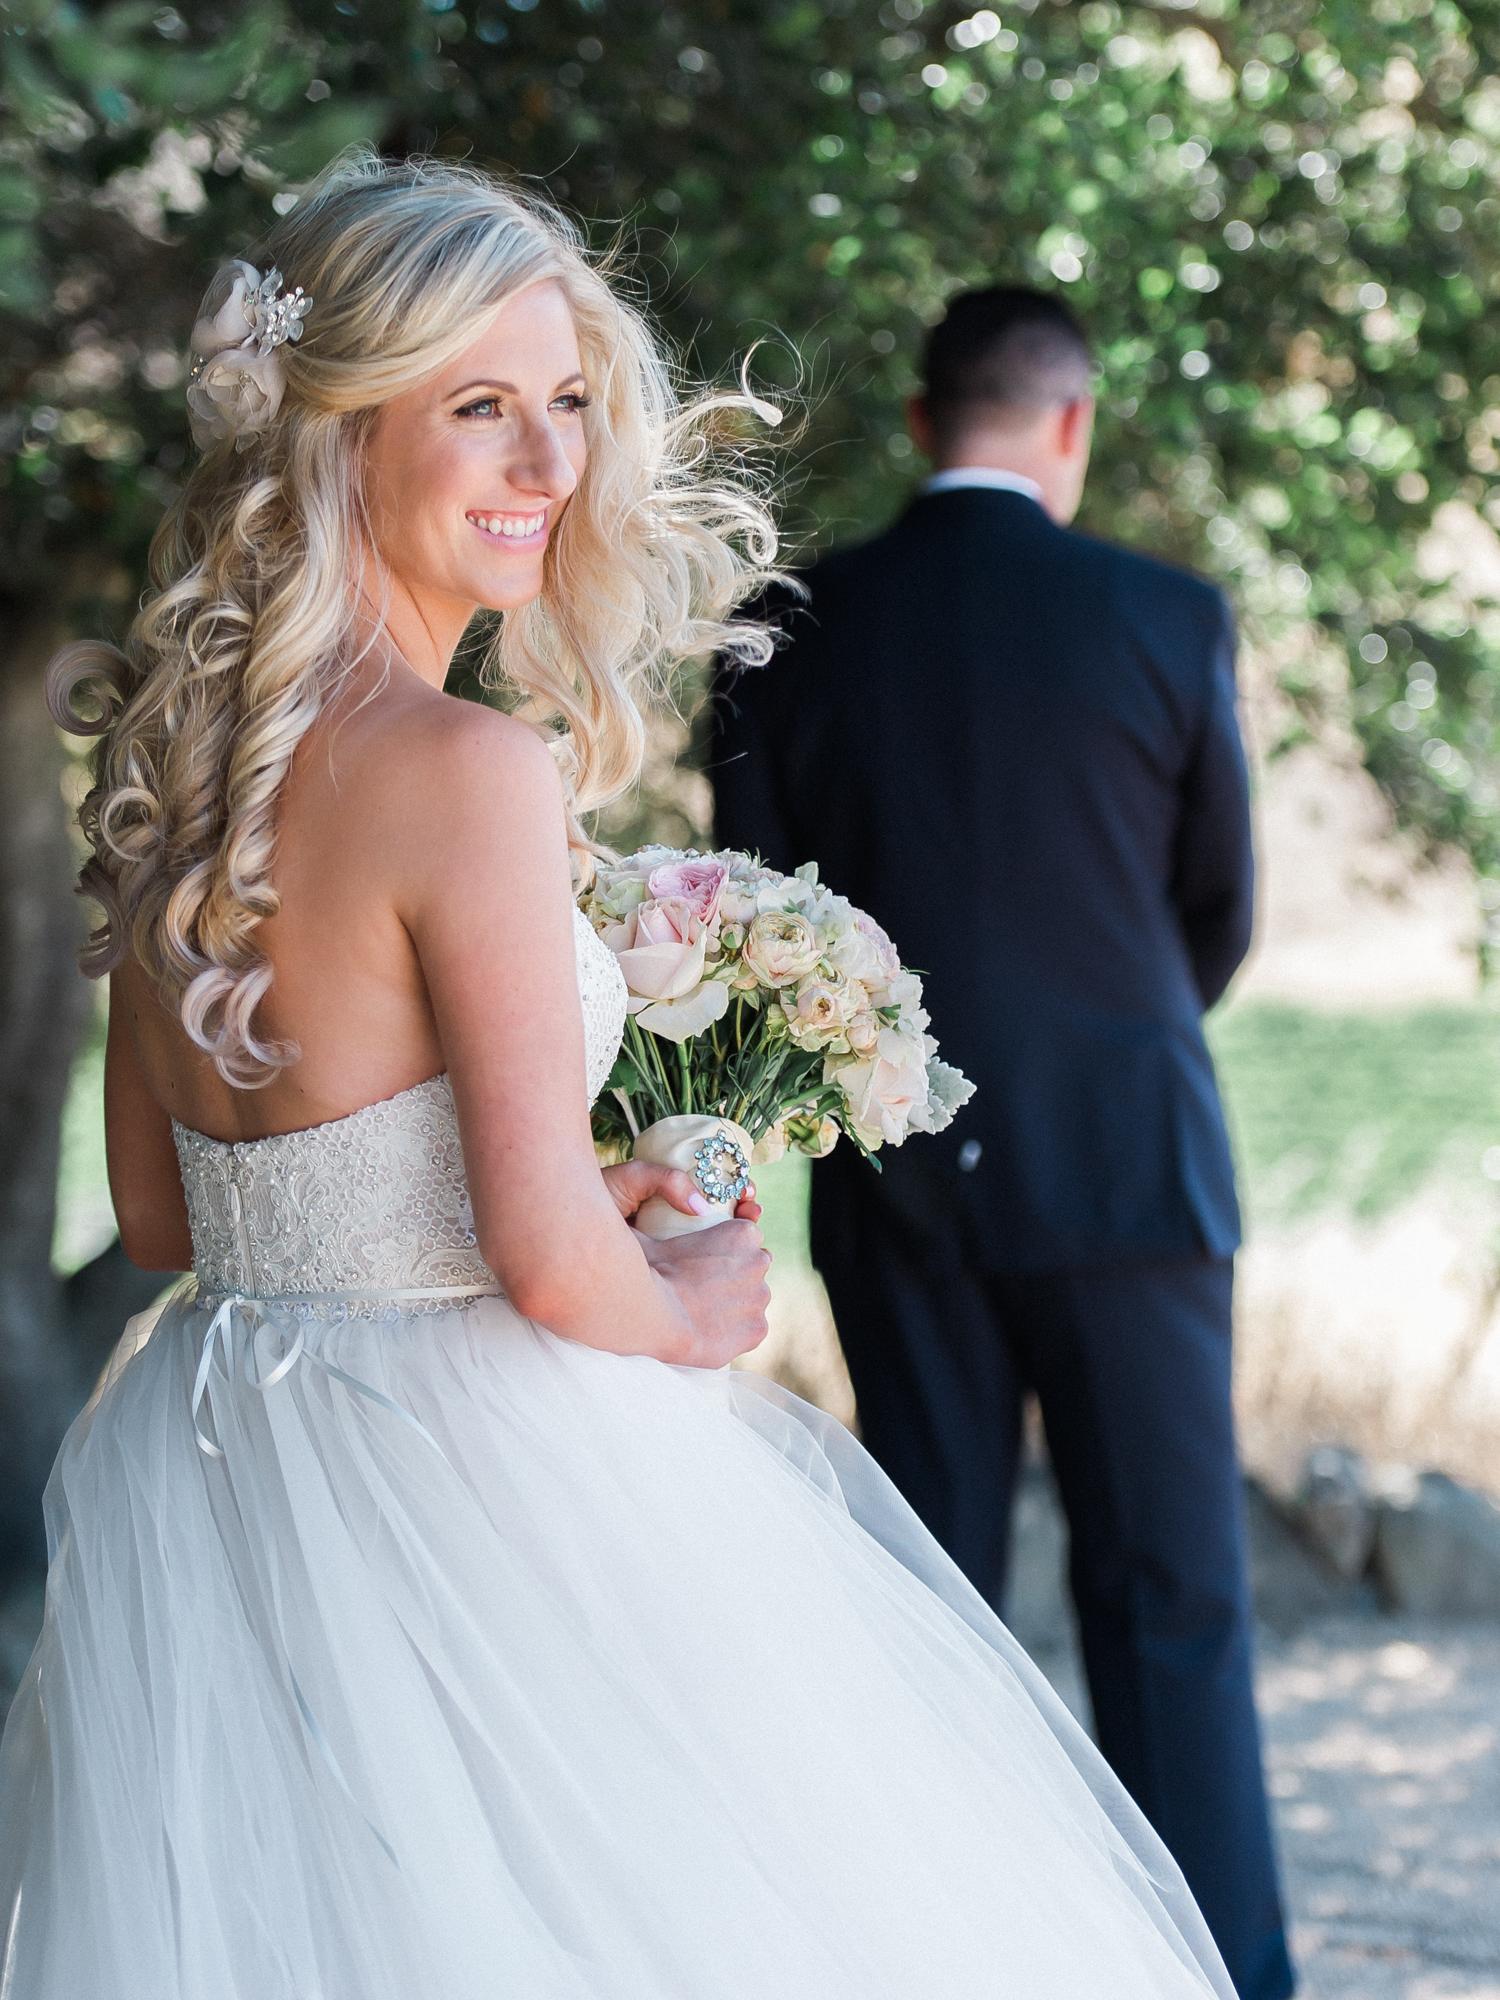 Aimee+Logan_wedding_spp-35.jpg